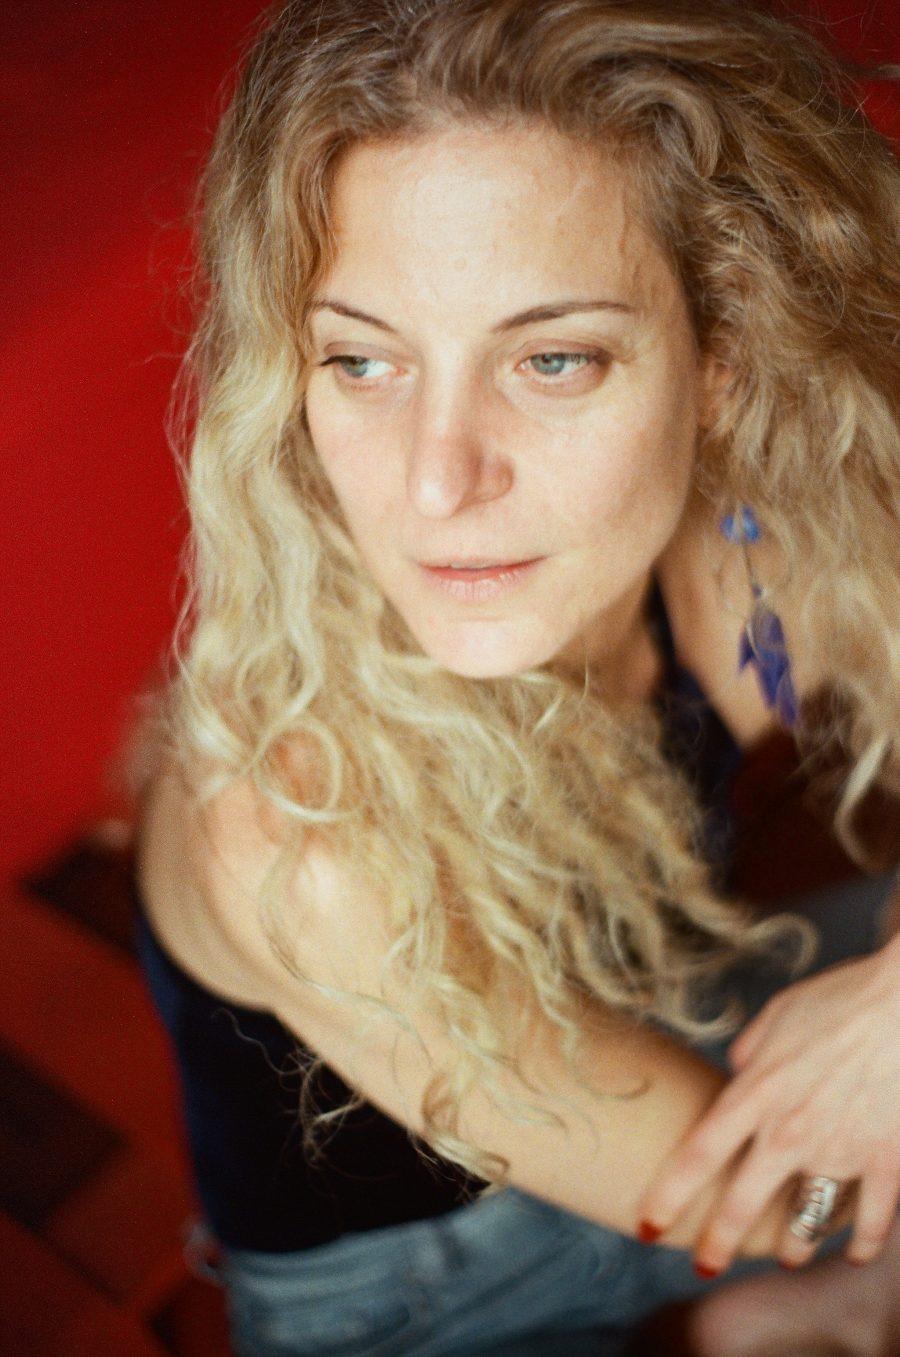 Natalia Nolli Sasso